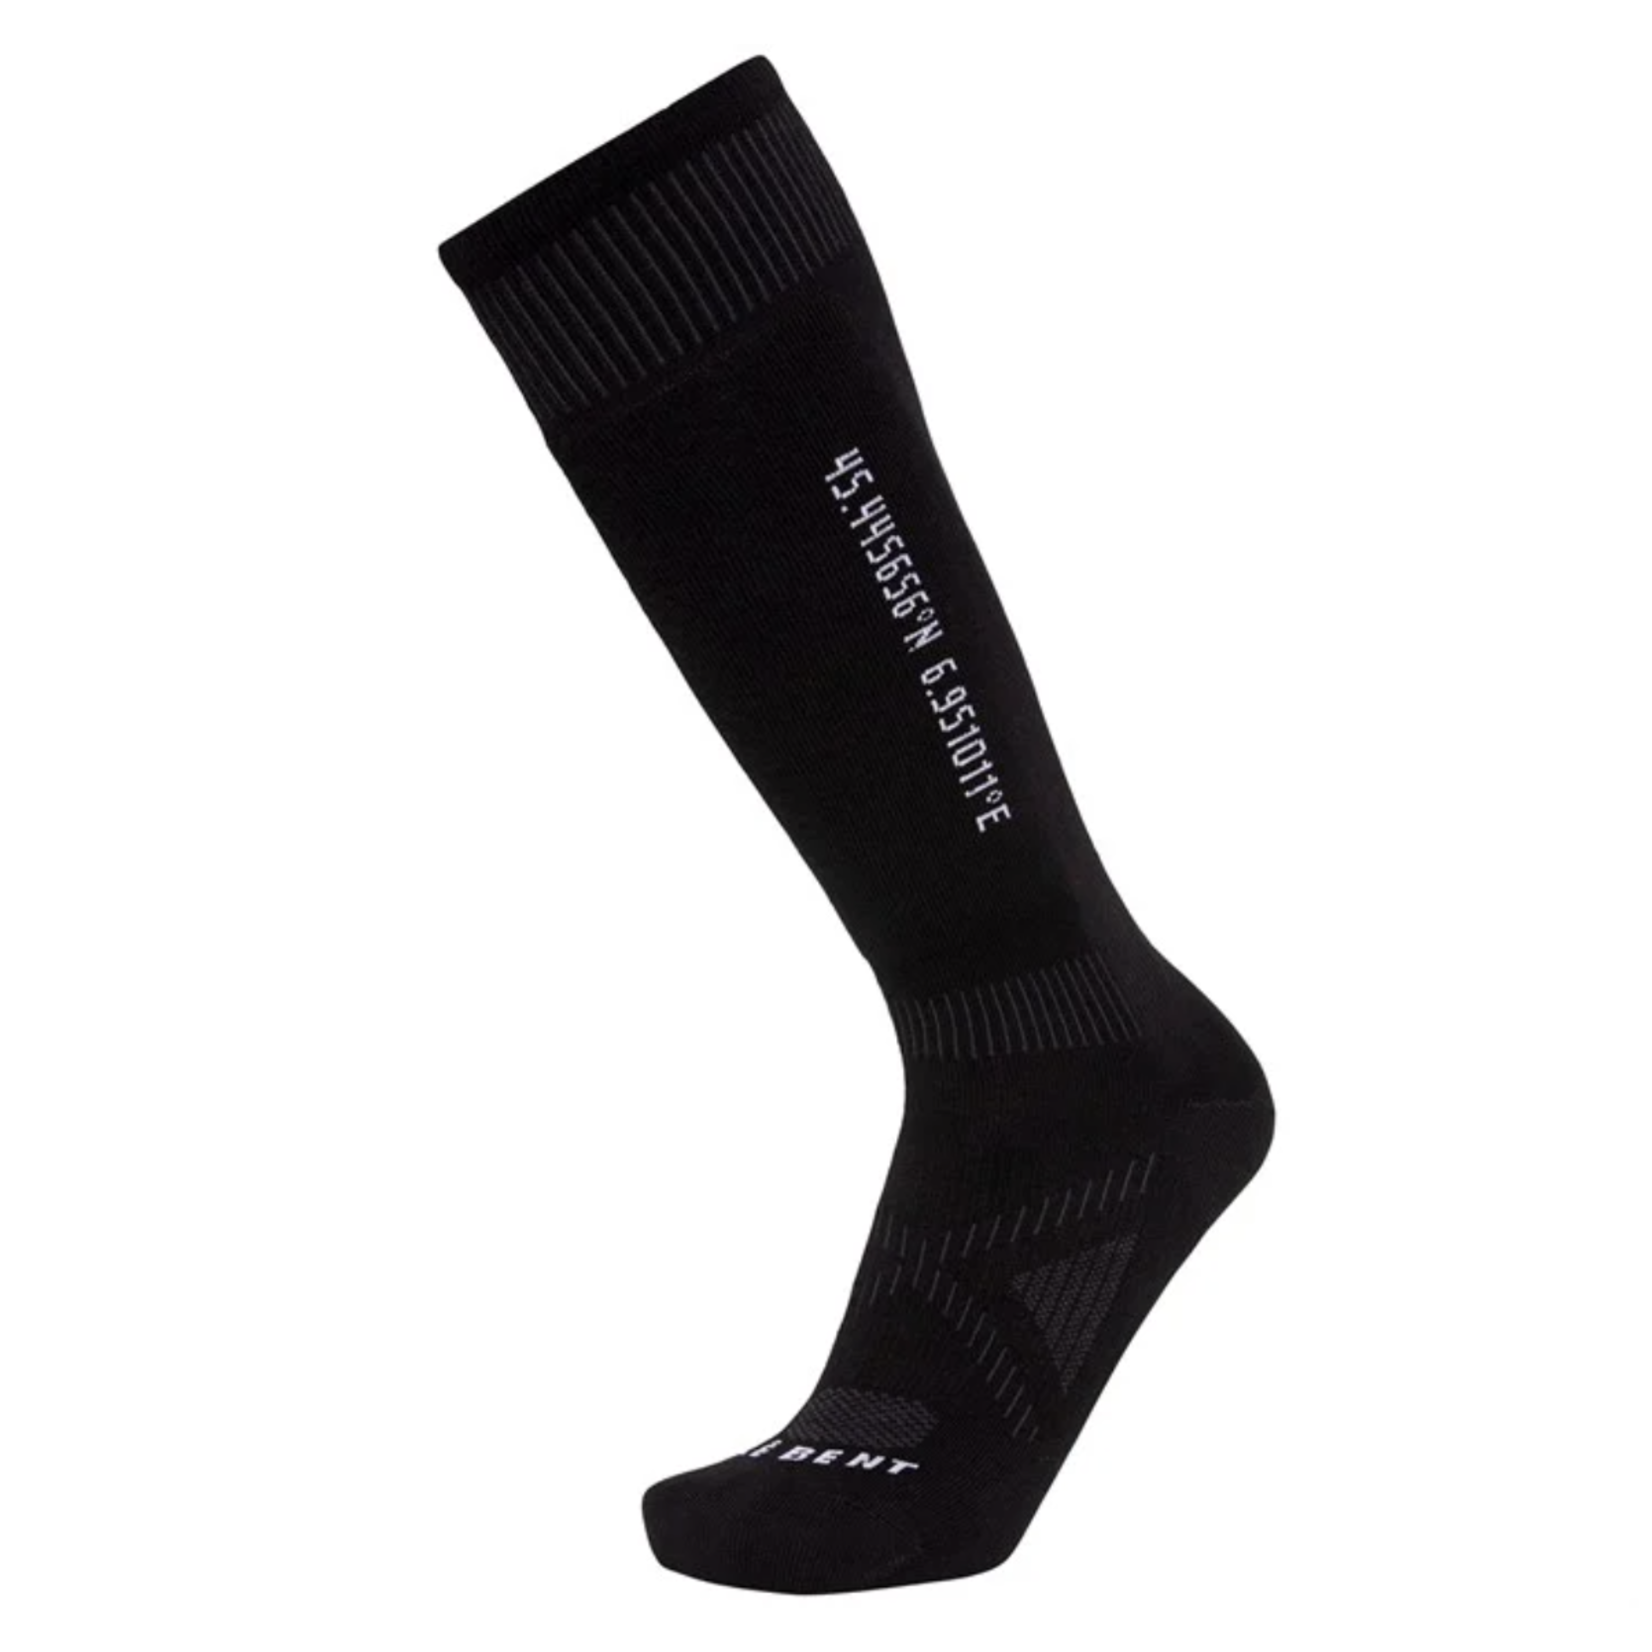 Le Bent Le Bent Sock Ultra Light